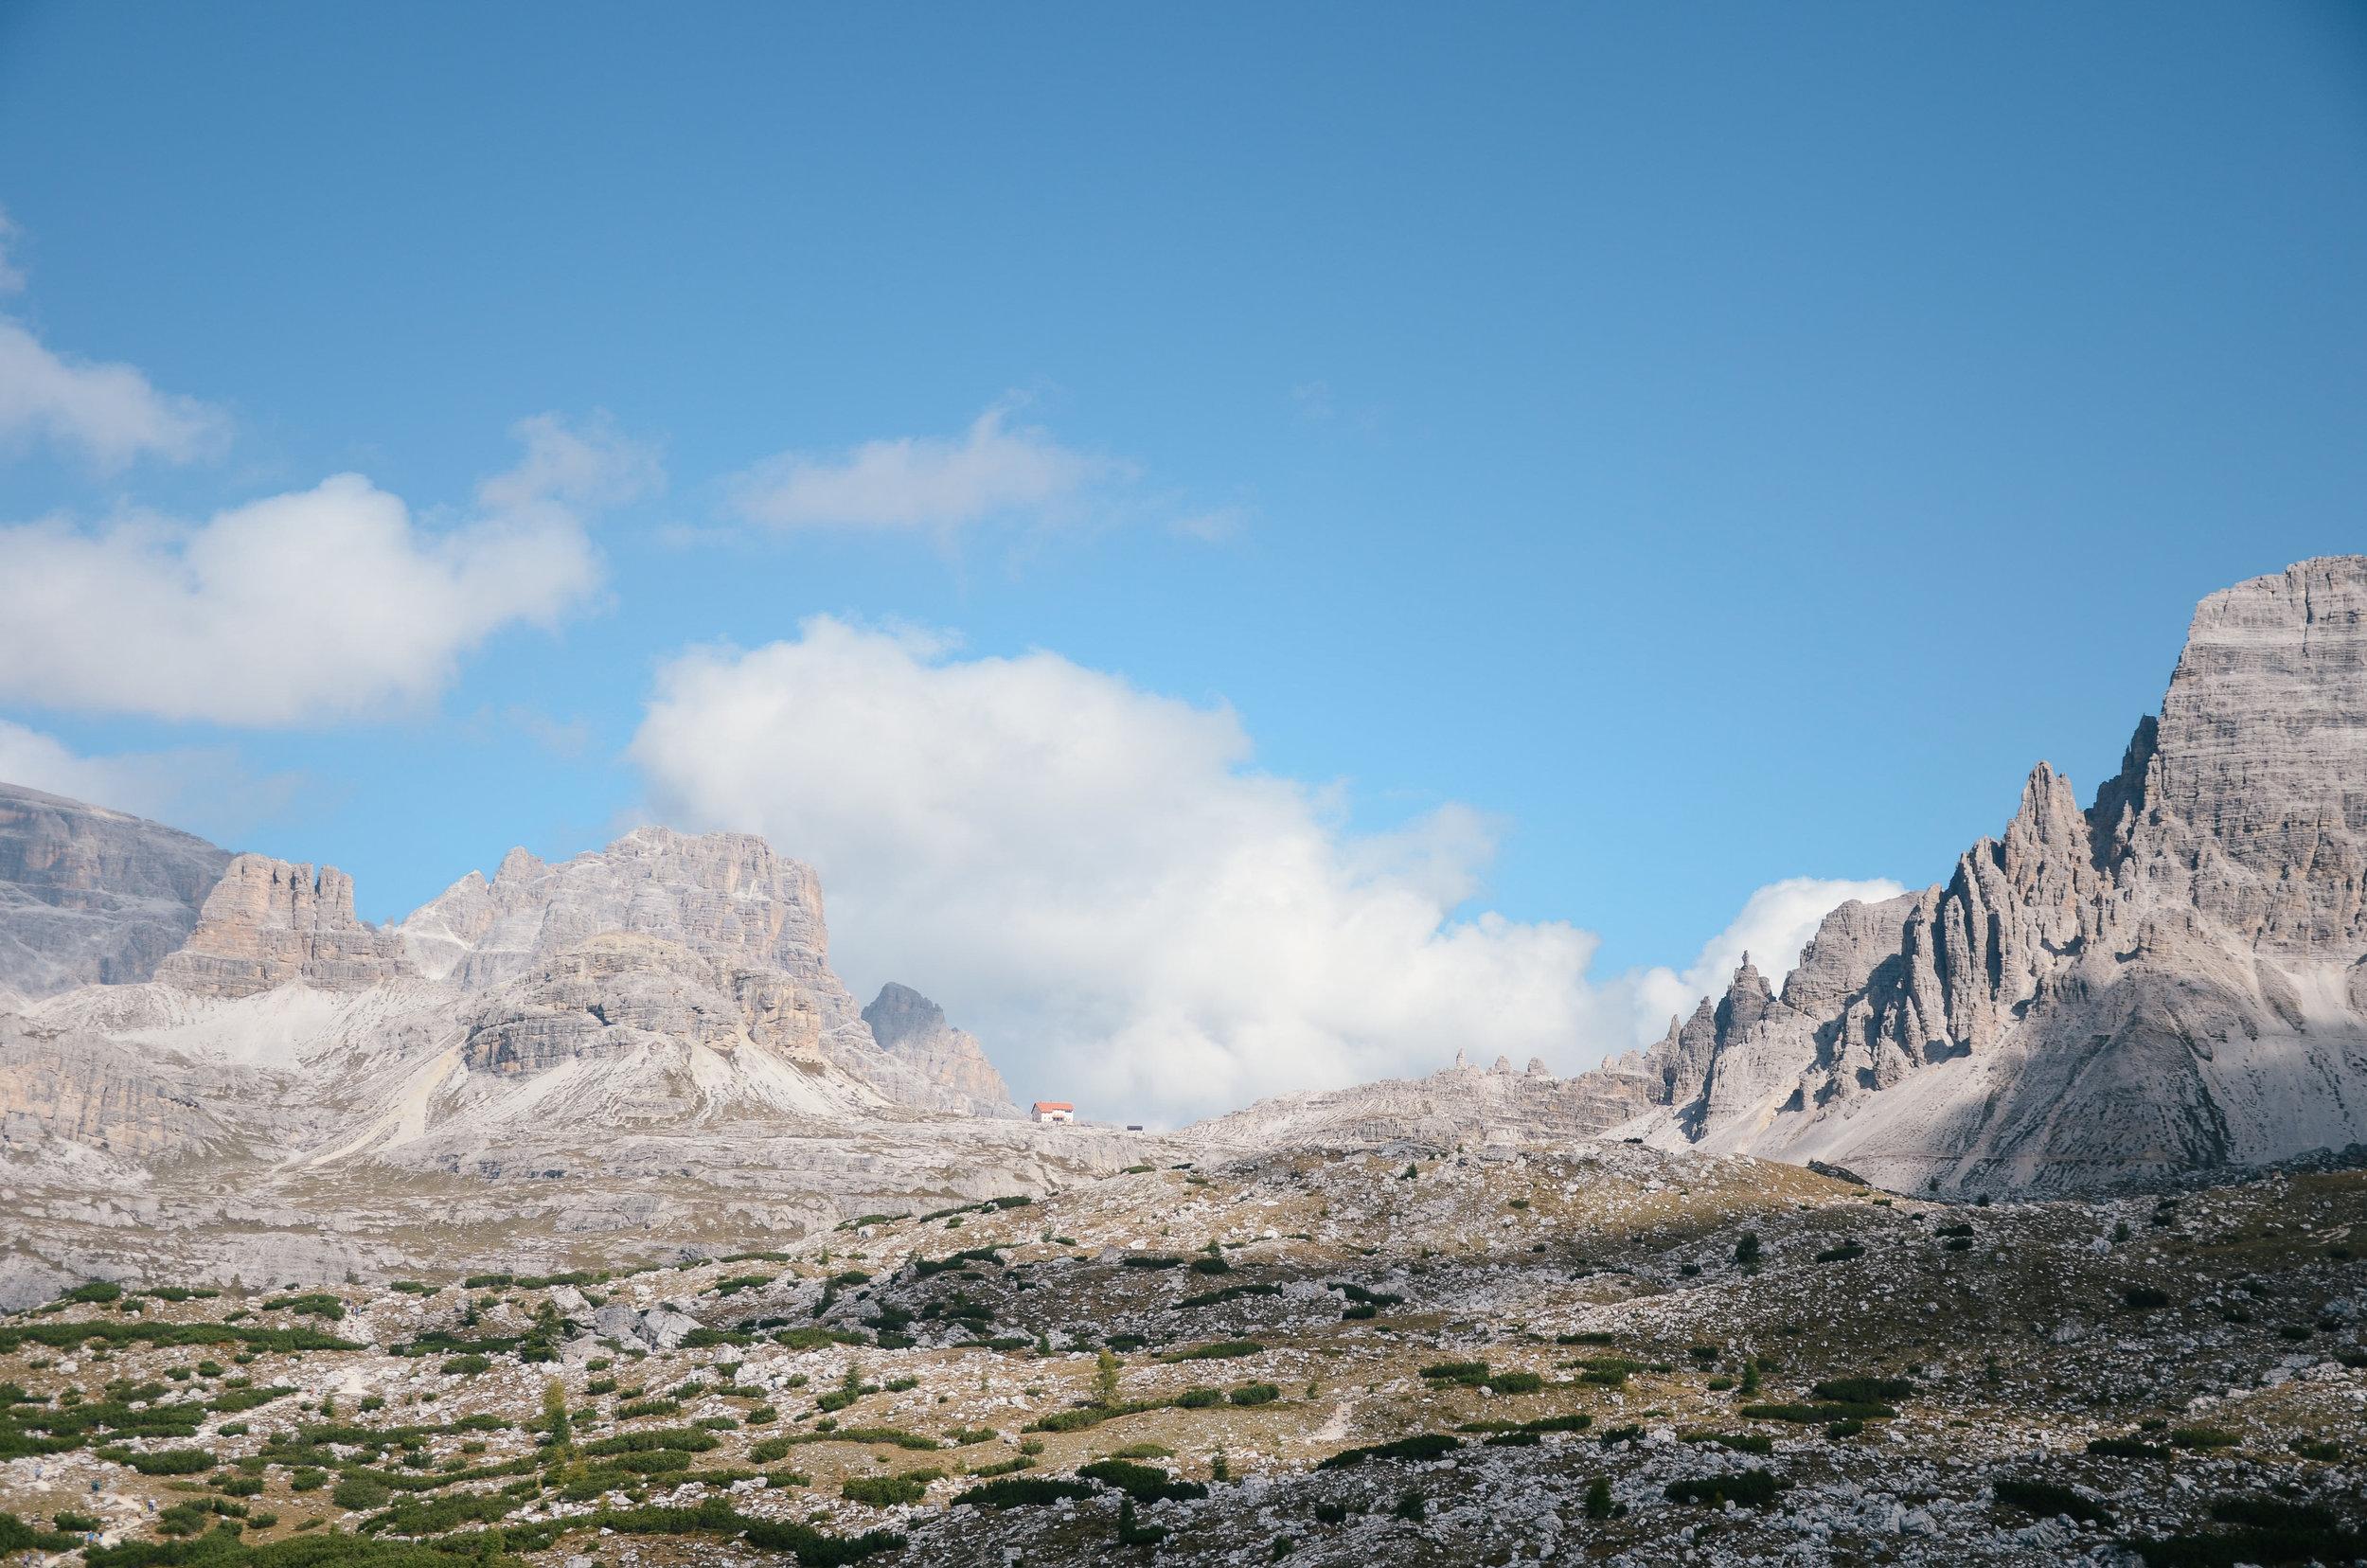 adventure-in-italy-3-hikes-dolomites-hiking-travel-blog-tyrol-30.jpg